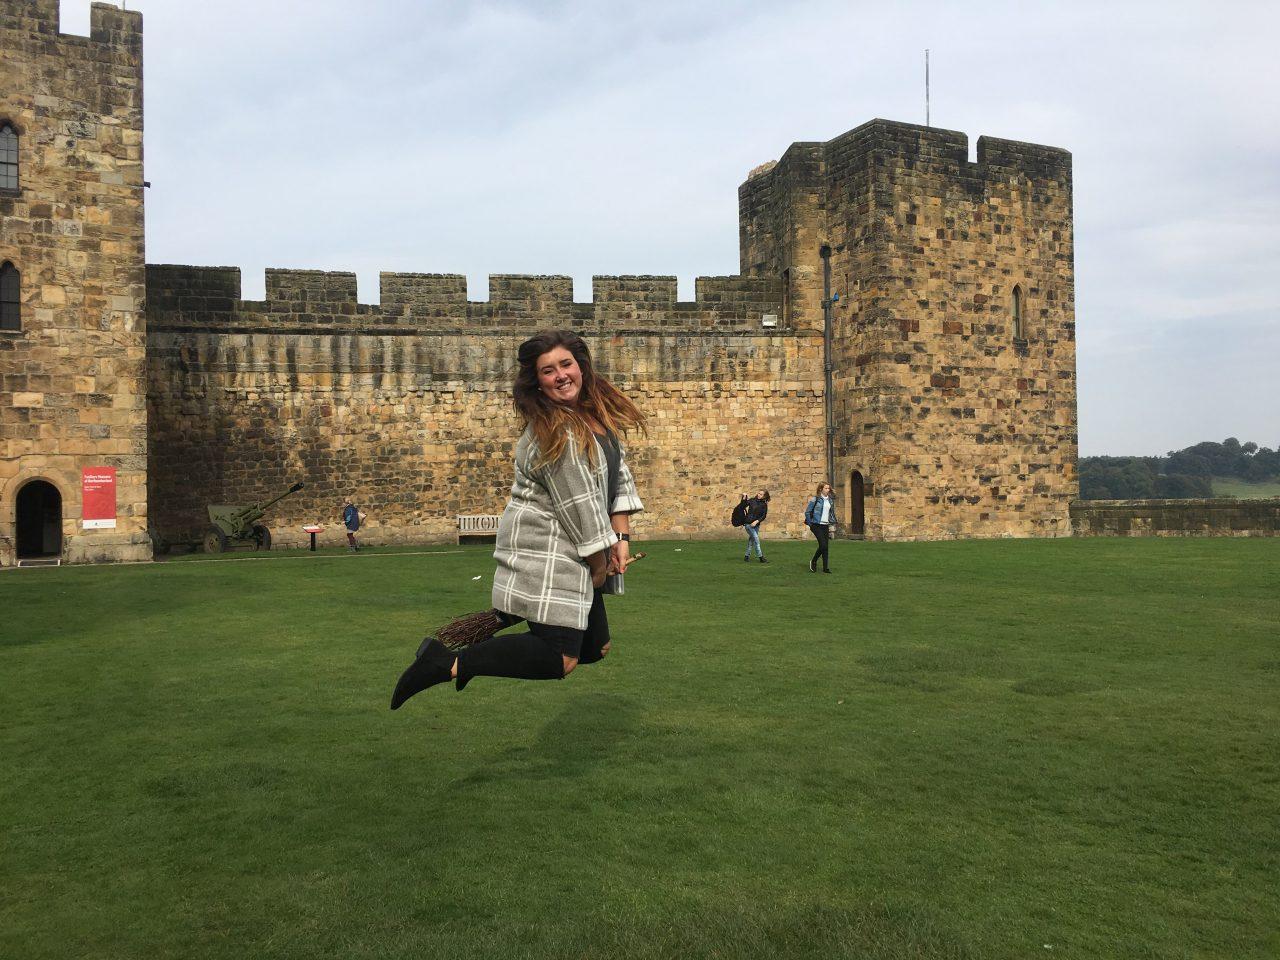 Hannah Lehman jumping in front of castle in Scotland